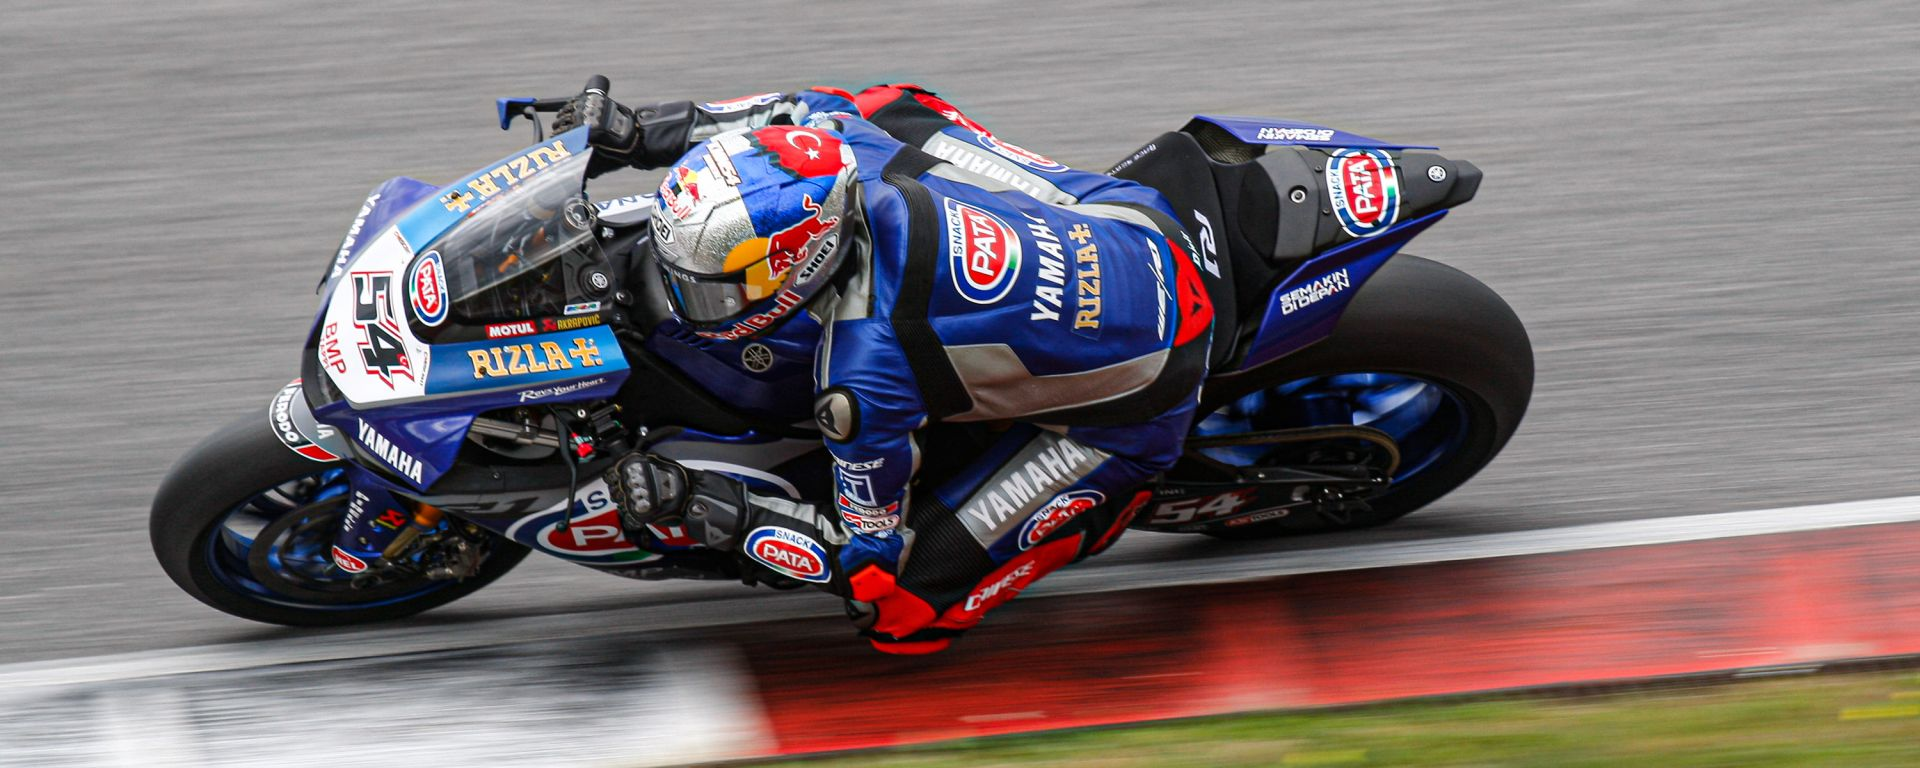 Test WorldSBK Superbike Portimao 2020, Toprak Razgatlioglu (Yamaha)